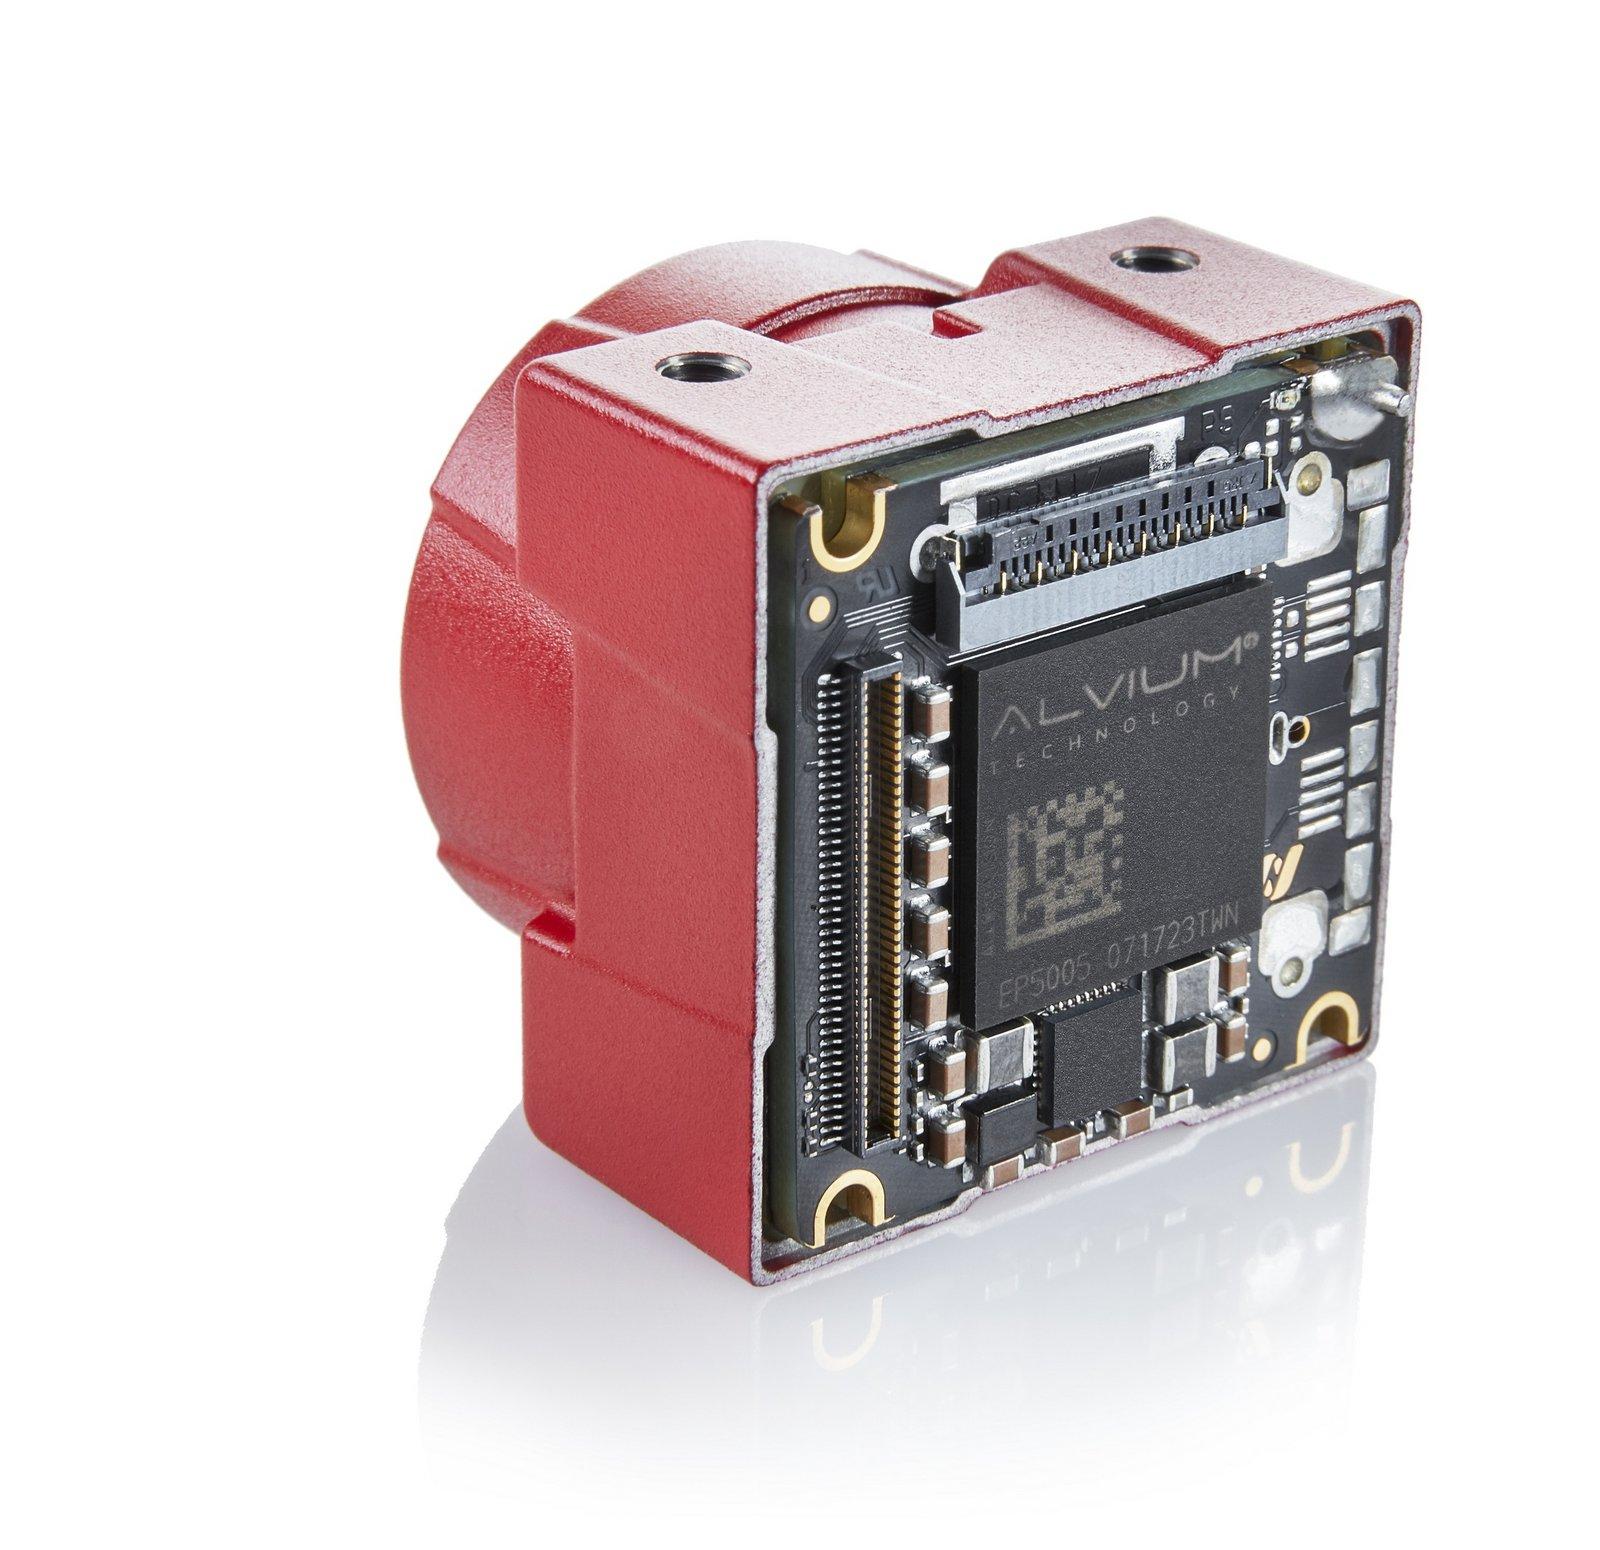 Alvium camera powered by ALVIUM Technology